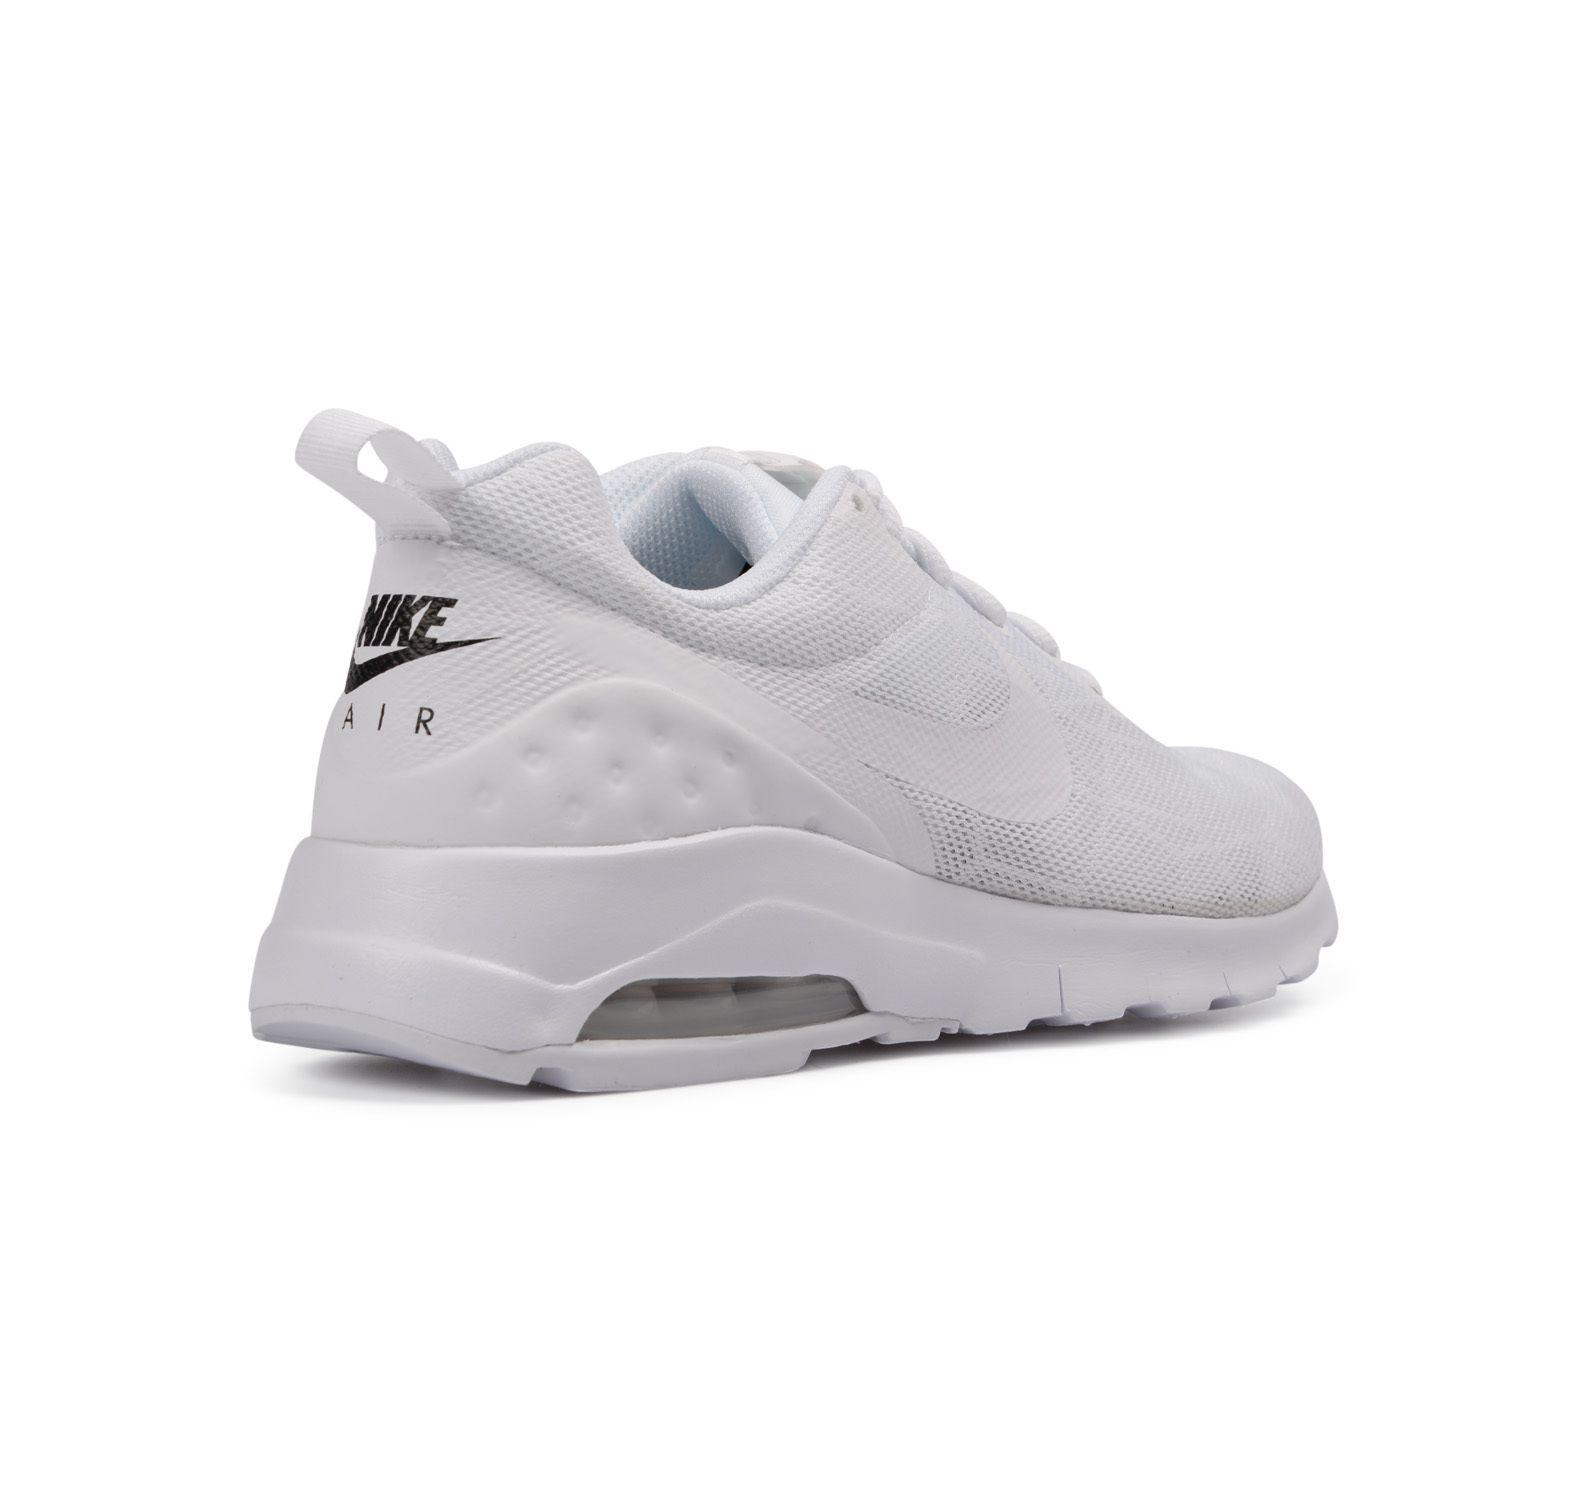 Köp Nike WMNS NIKE AIR MAX MOTION LW SE Dam Sportshopen